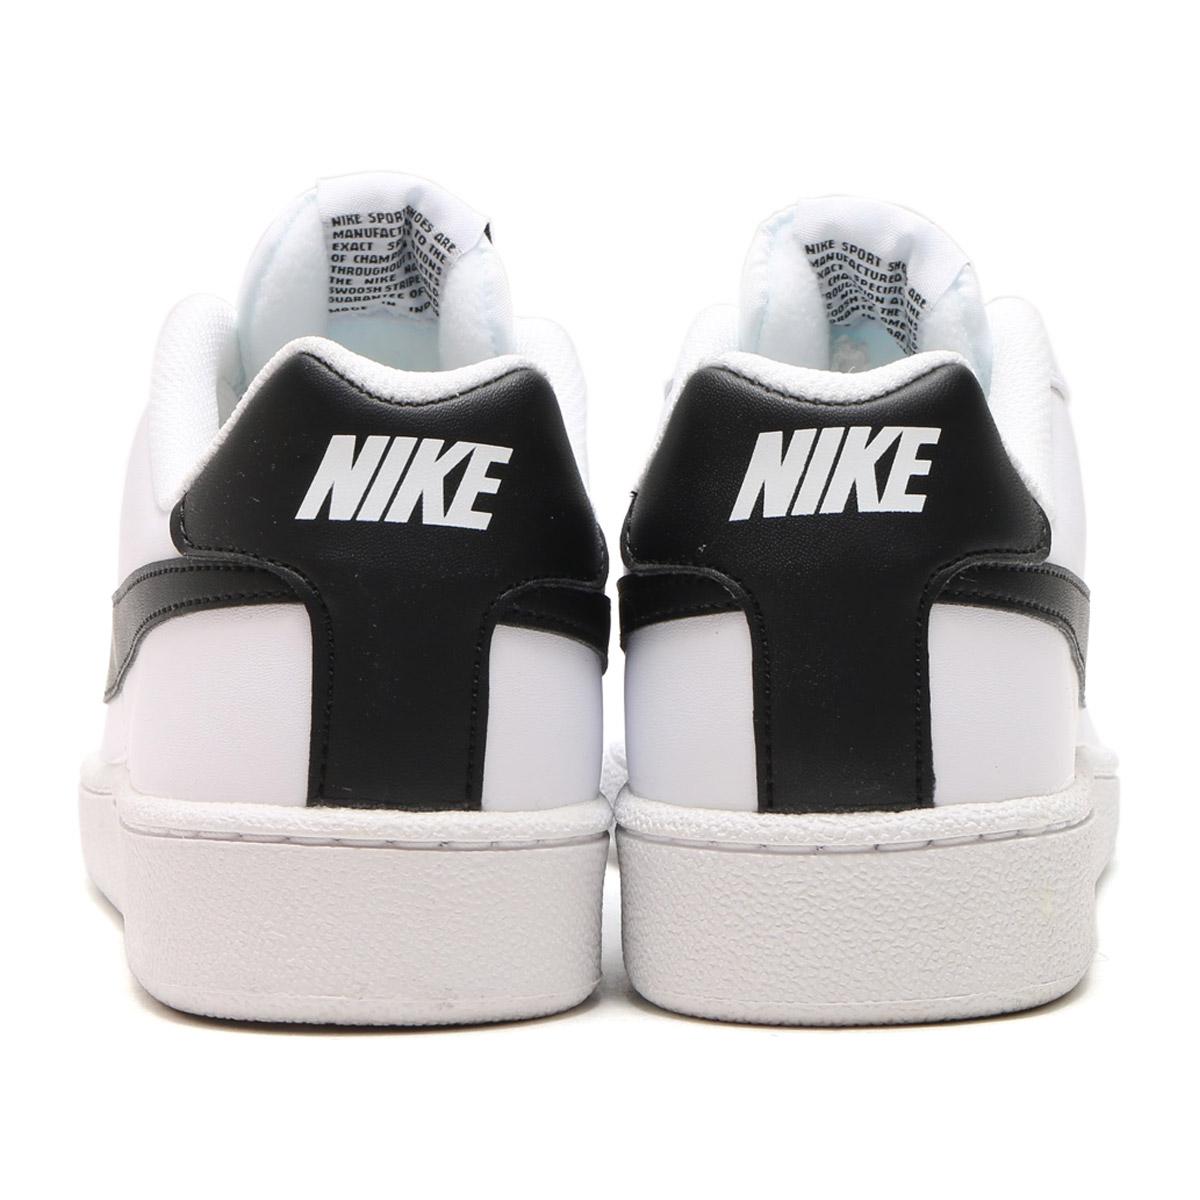 NIKE COURT ROYALE SL (나이키 코트 로얄 SL) WHITE/BLACK 16FA-I